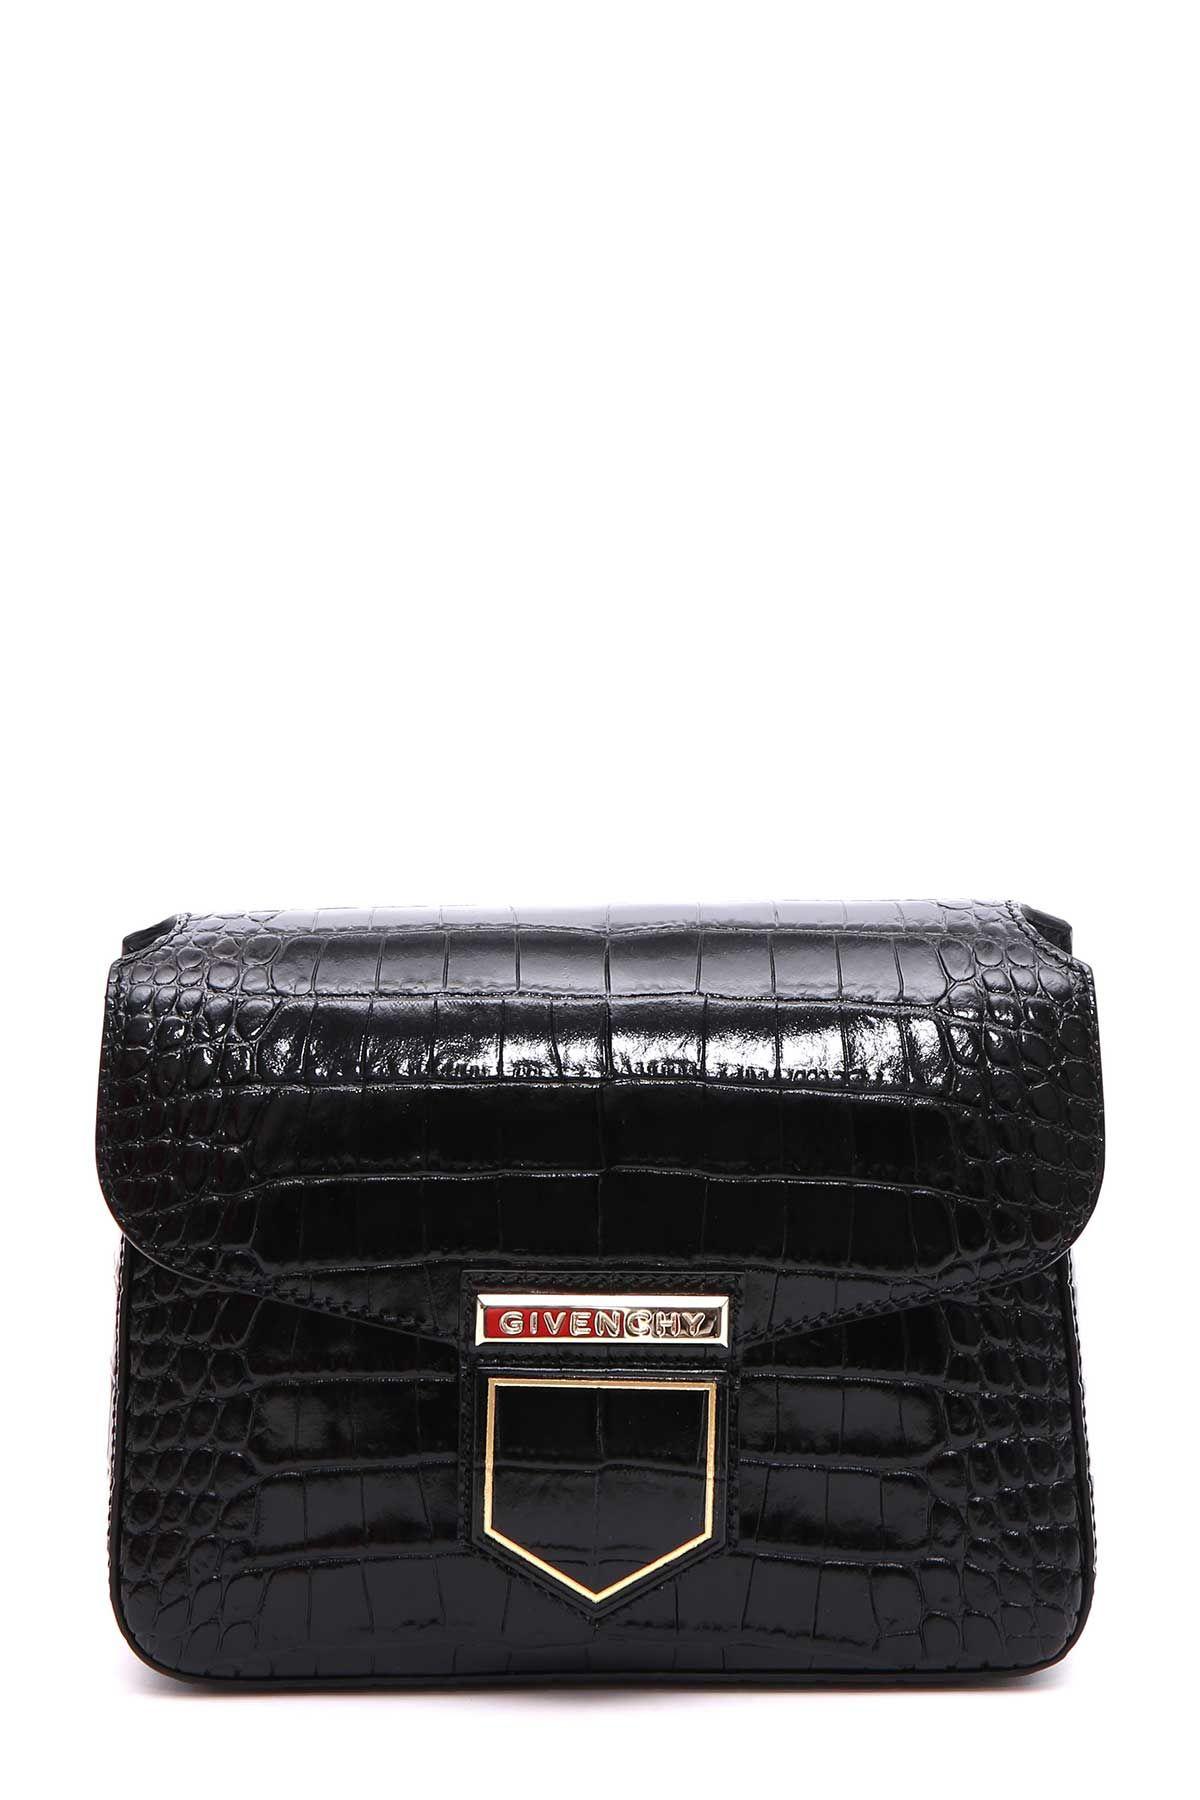 Givenchy nobile Crossbody Bag